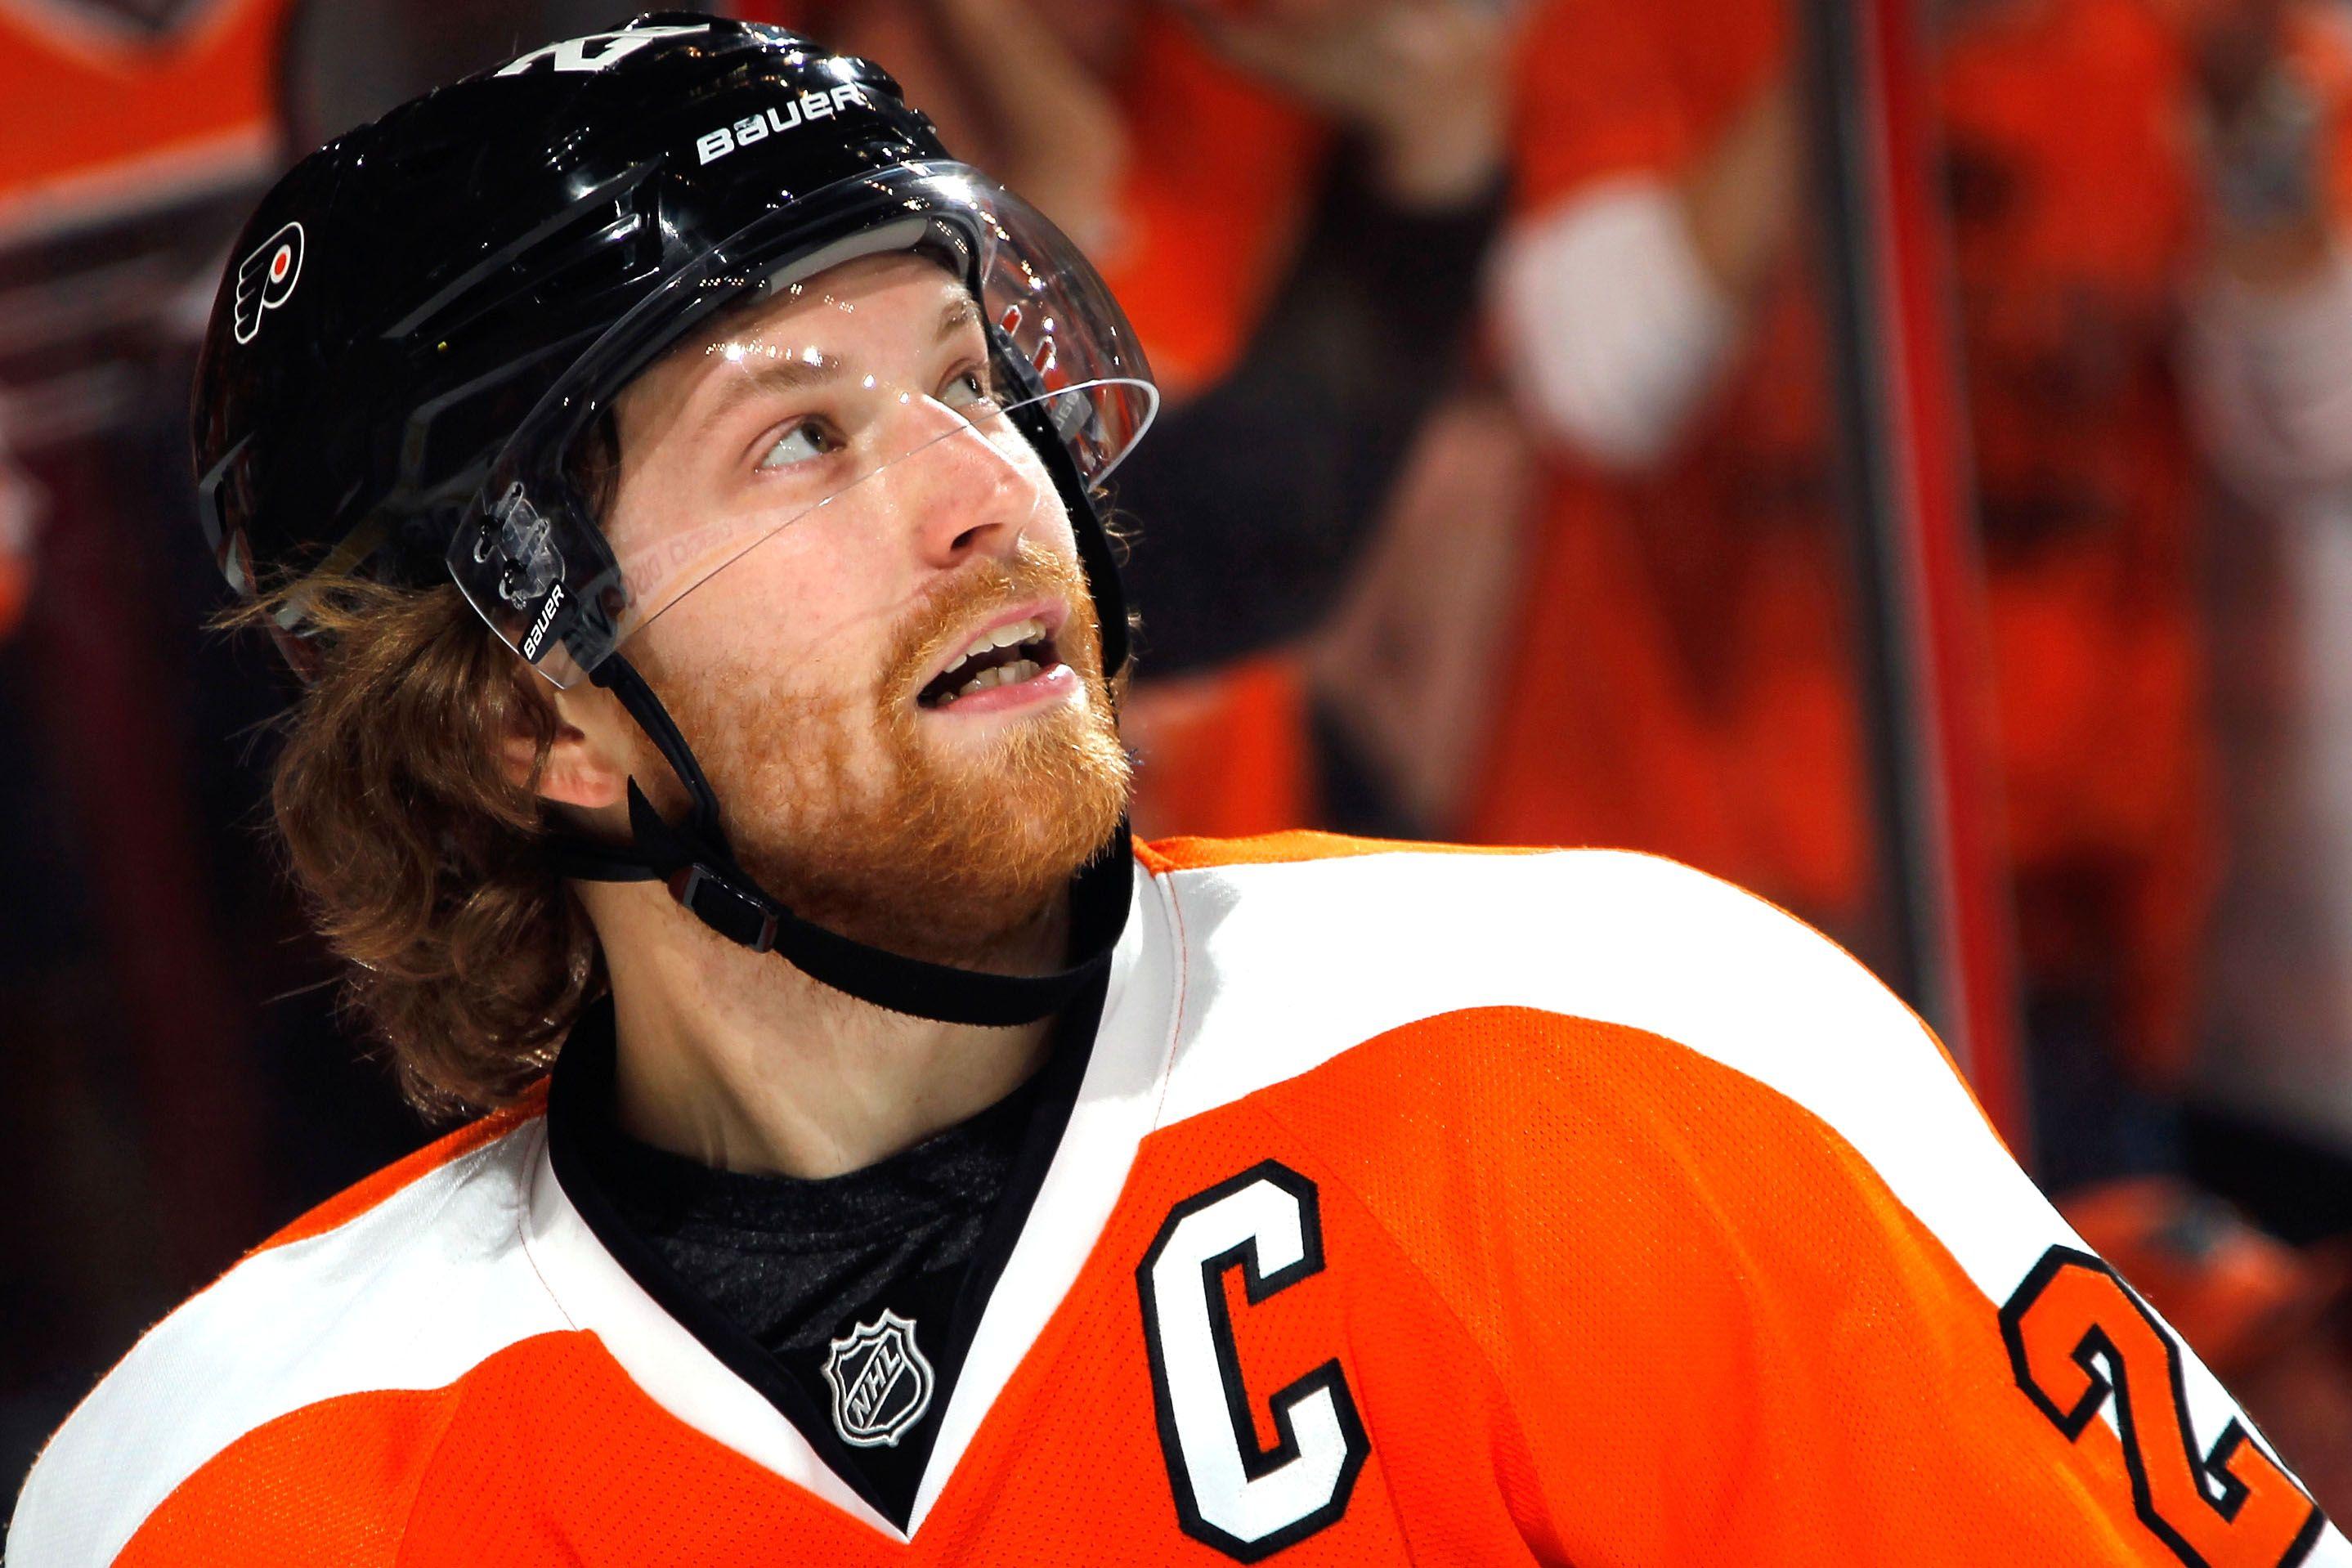 Claude Giroux Philadephia Flyers National hockey league